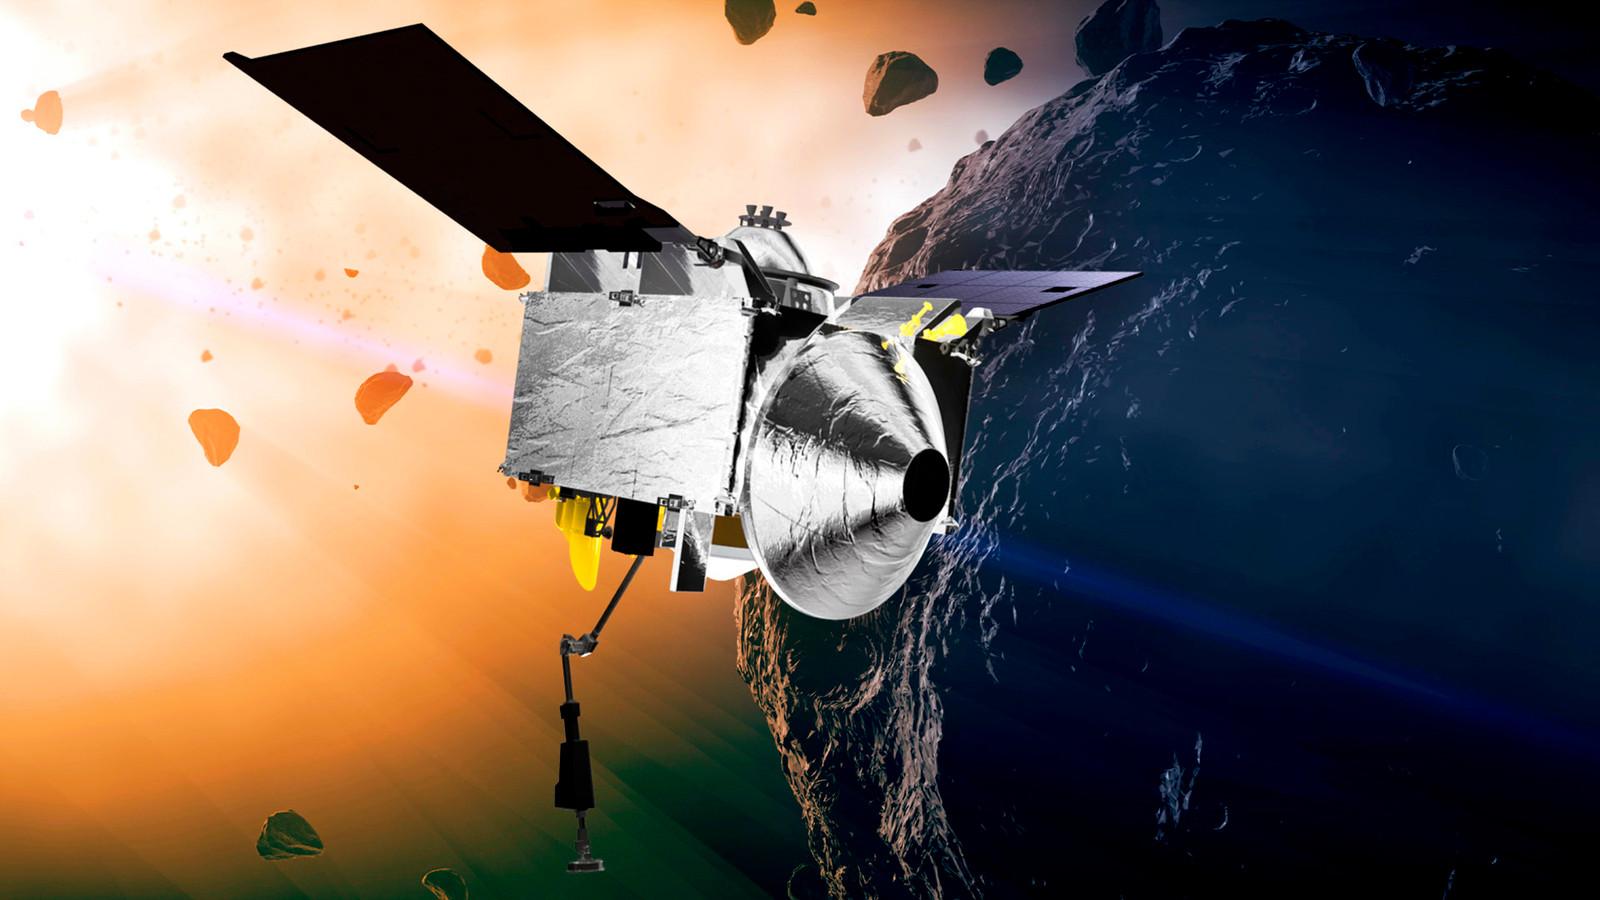 Osiris-Rex cirkelt sinds eind vorig jaar om de asteroïde Bennu.